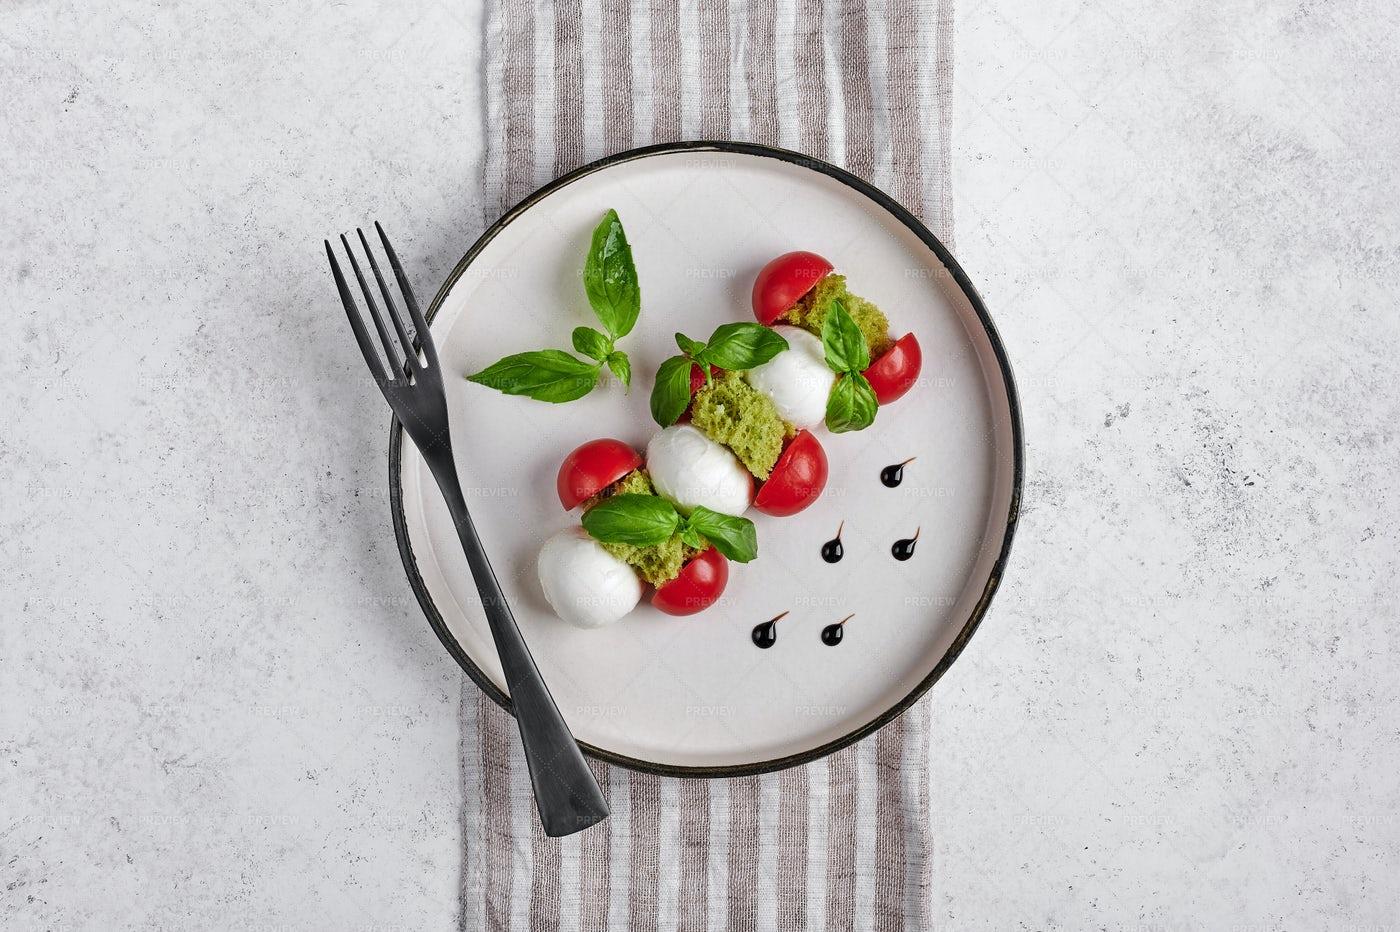 Fork On A Salad Plate: Stock Photos